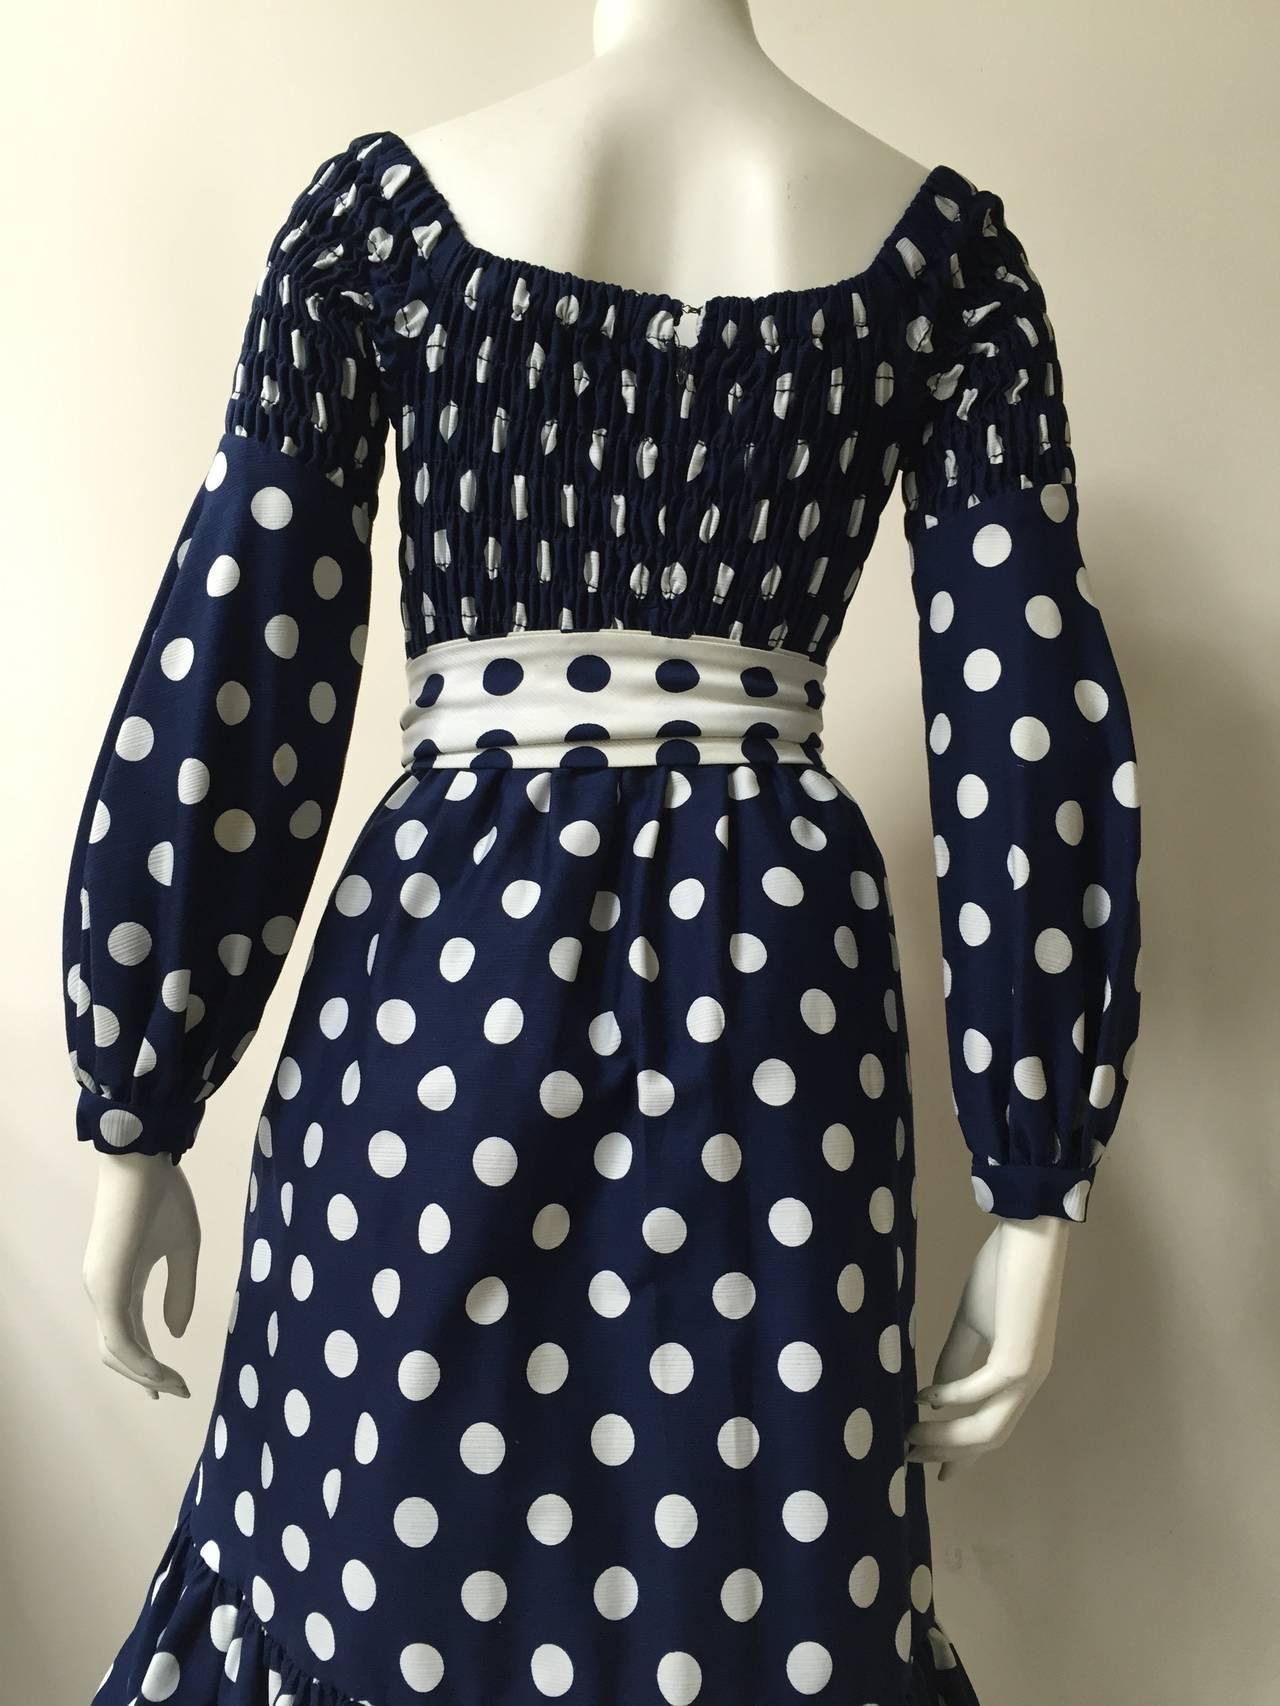 Oscar de la Renta 1970 polka dot Harper's Bazaar dress cover size 4. For Sale 1